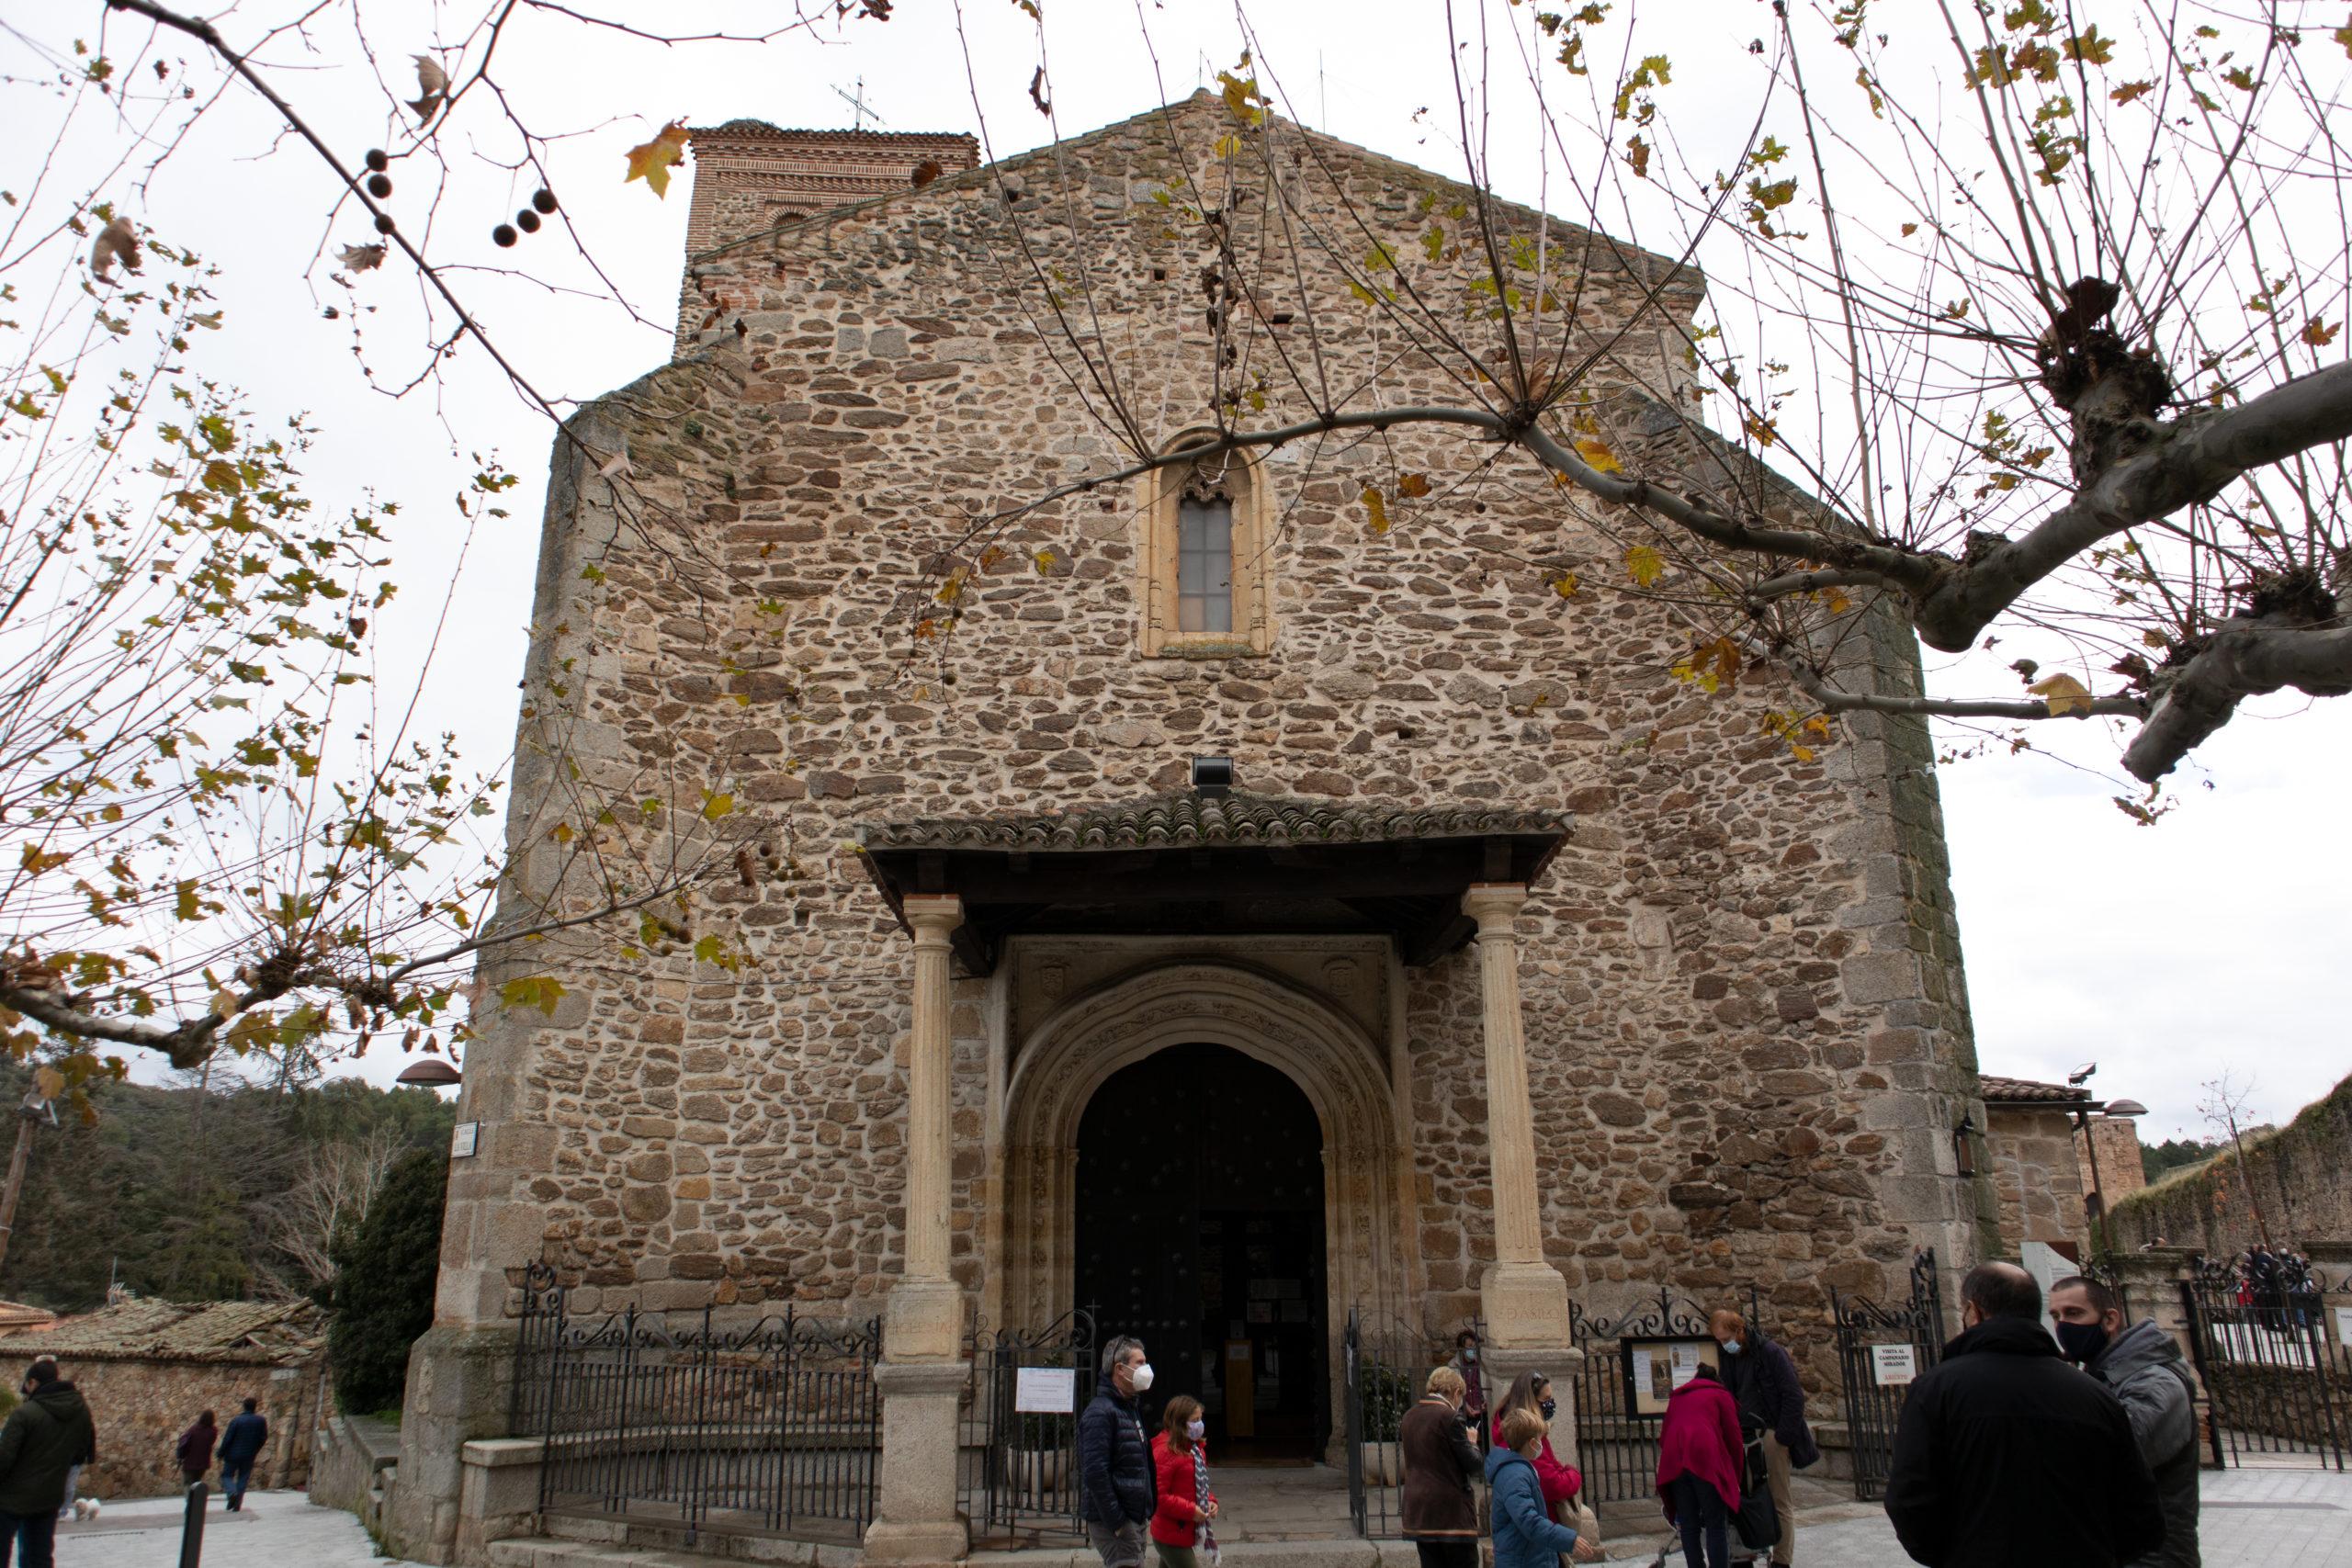 iglesia-santa-maria-castillo-Buitrago-del-Lozoya